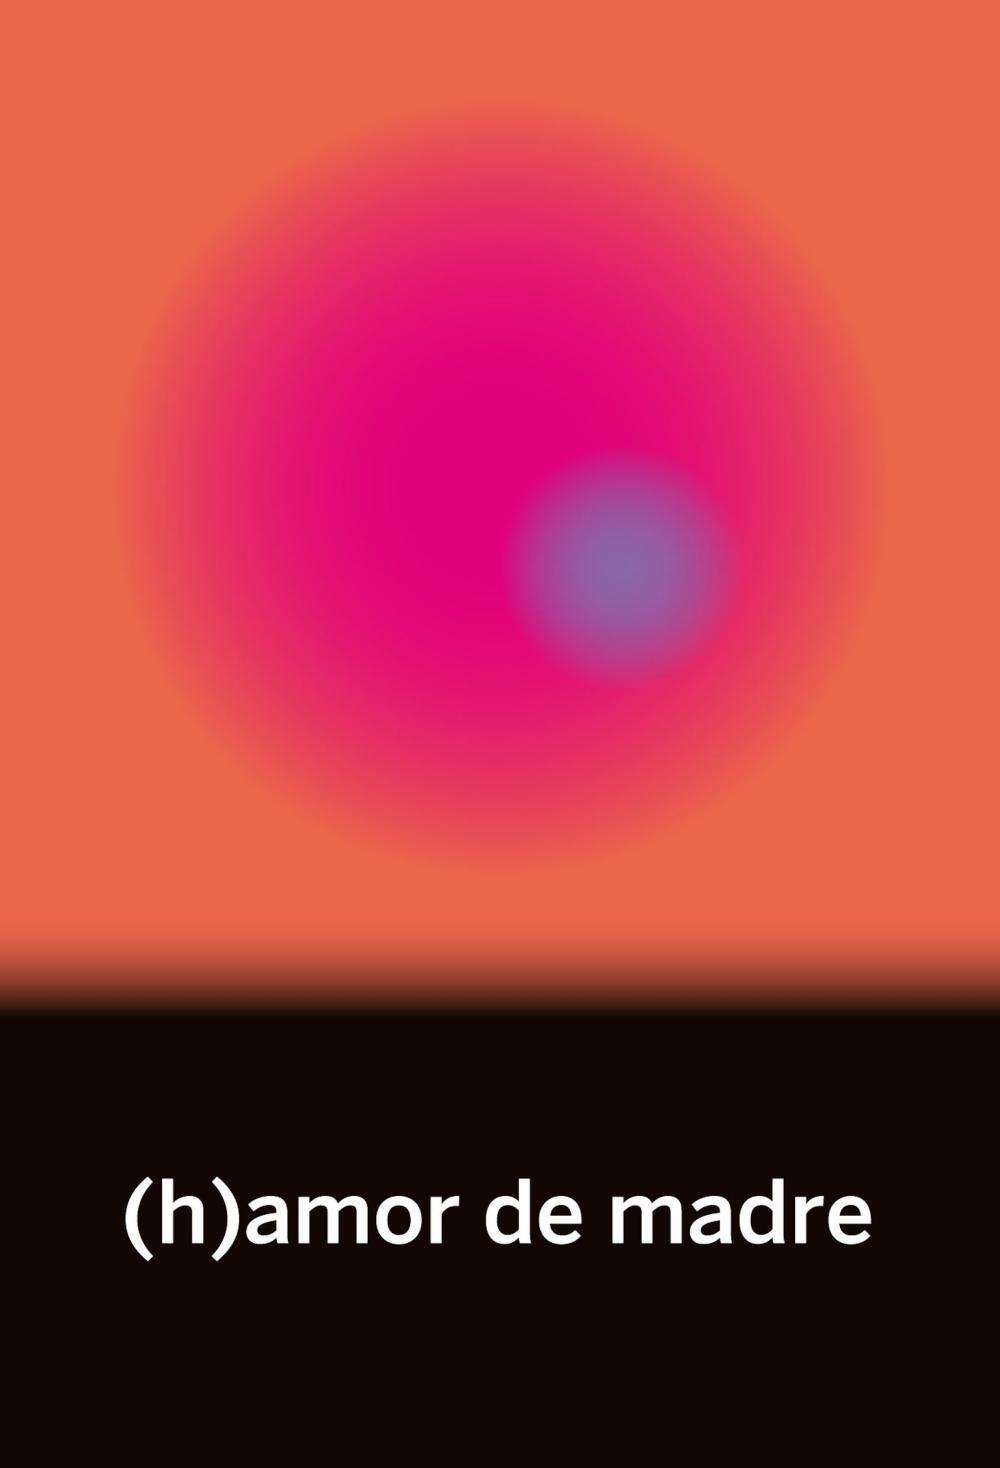 (h)amor de madre